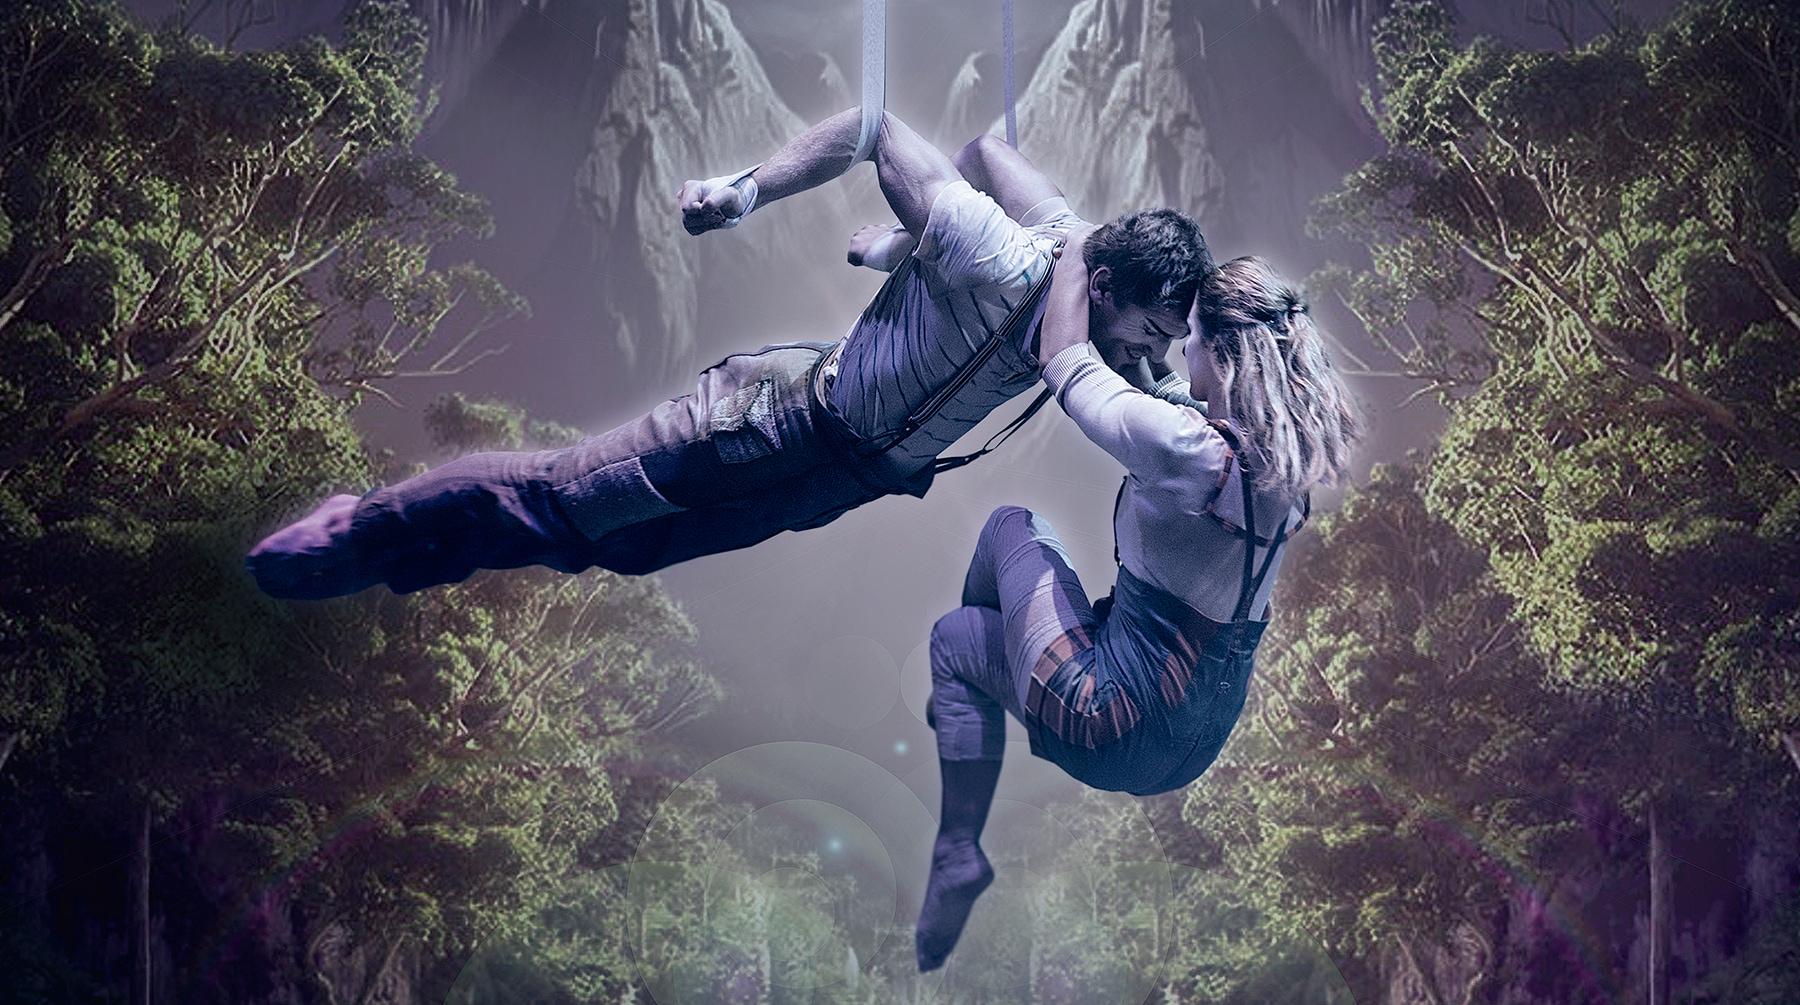 Cirque du Soleil celebrates 10 years of Illa Carlemany